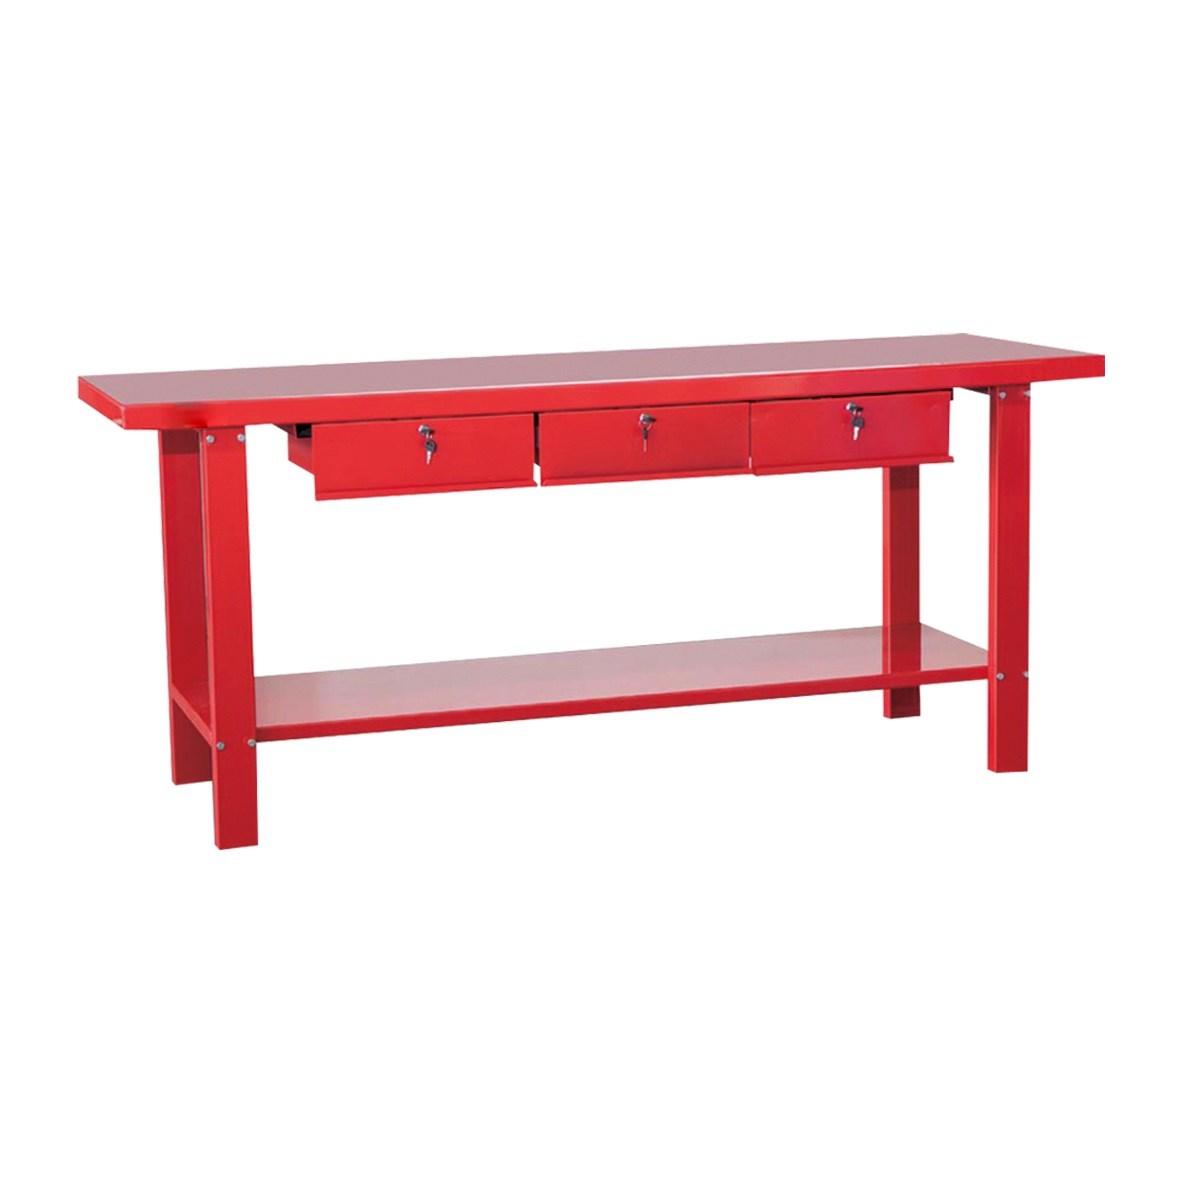 Horme Hd Metal Work Bench 2000w*640d*865h, TSC79111